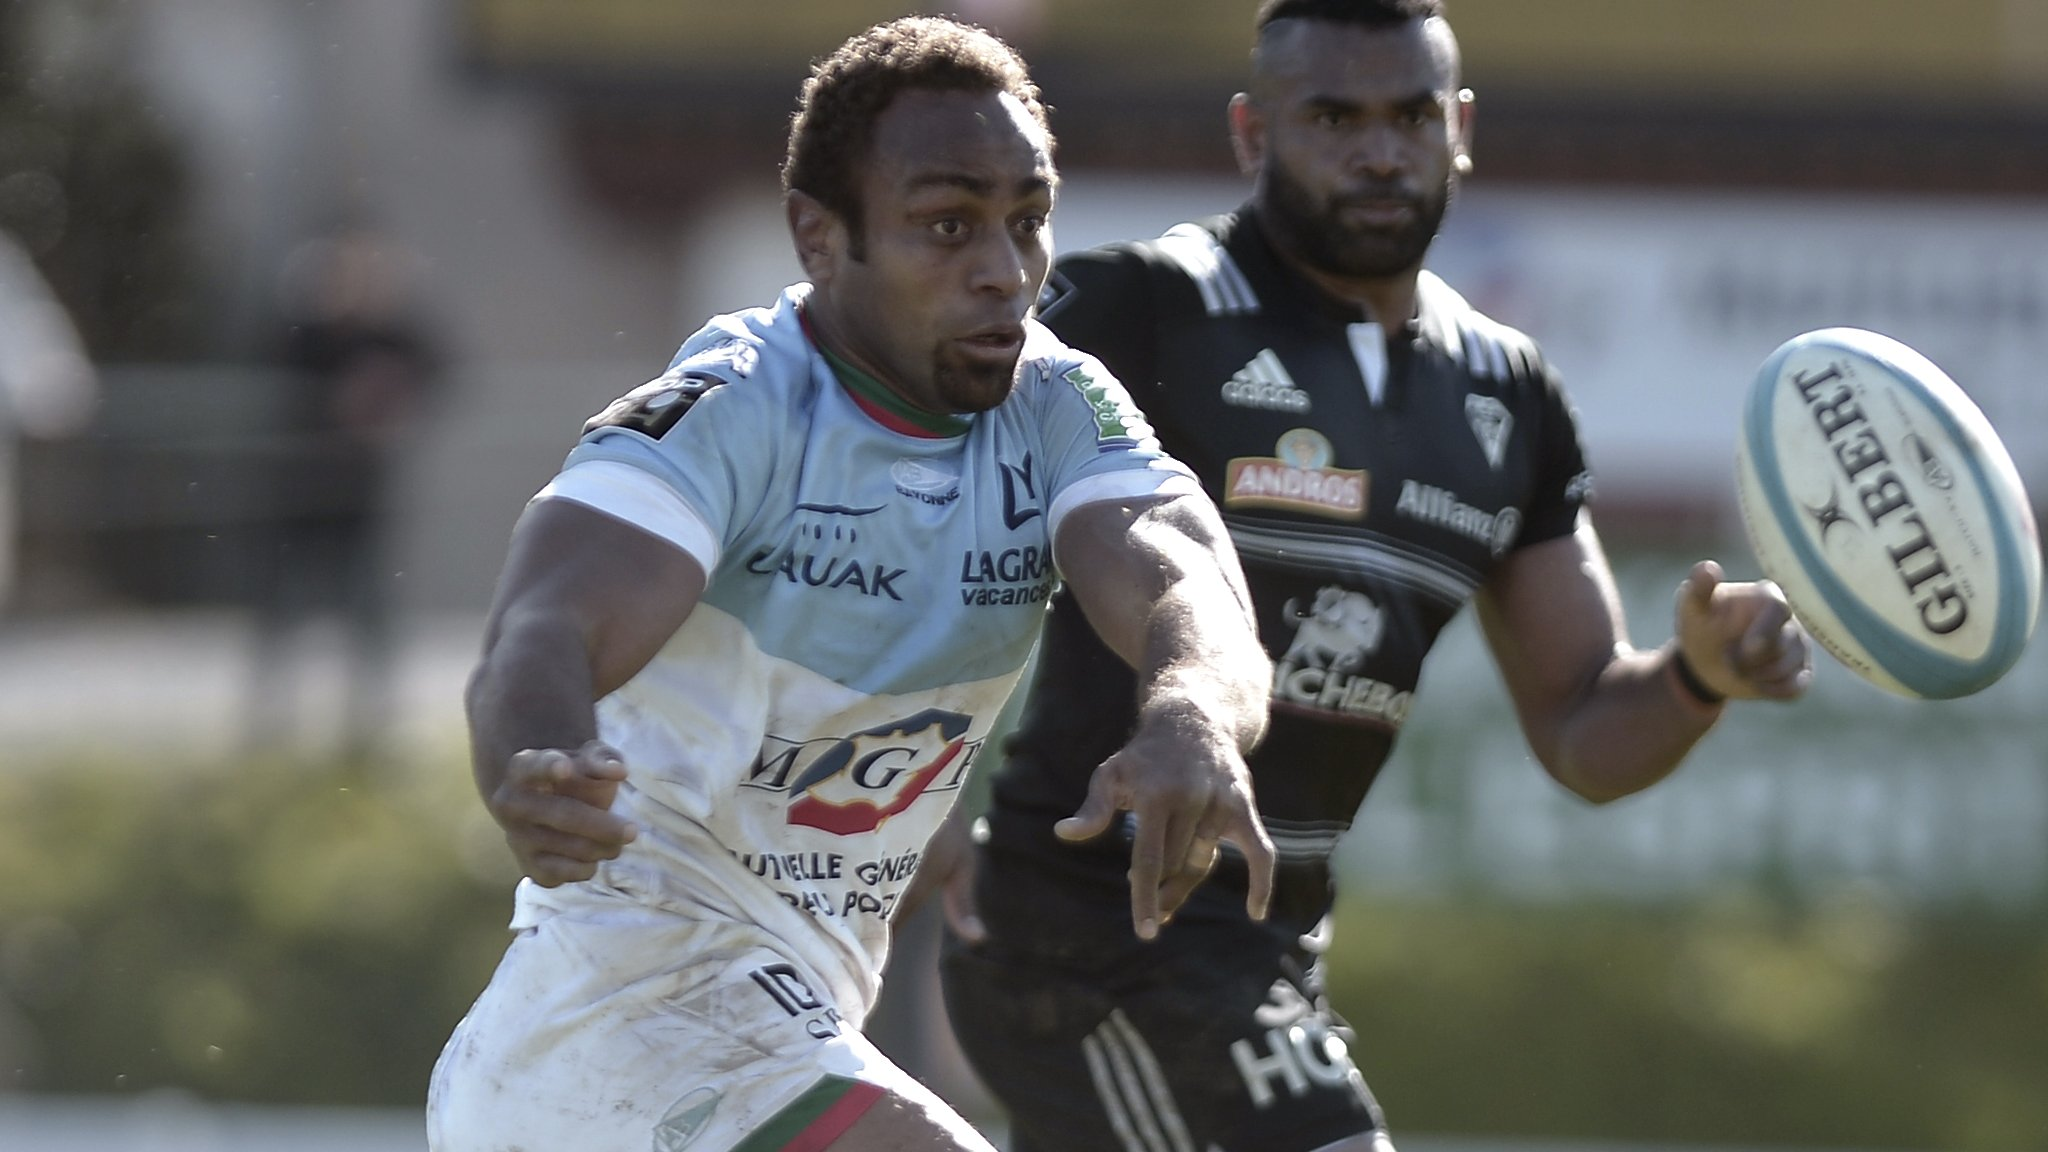 Wasps: Fiji centre Gaby Lovobalavu signs for 2017-18 season from Bayonne